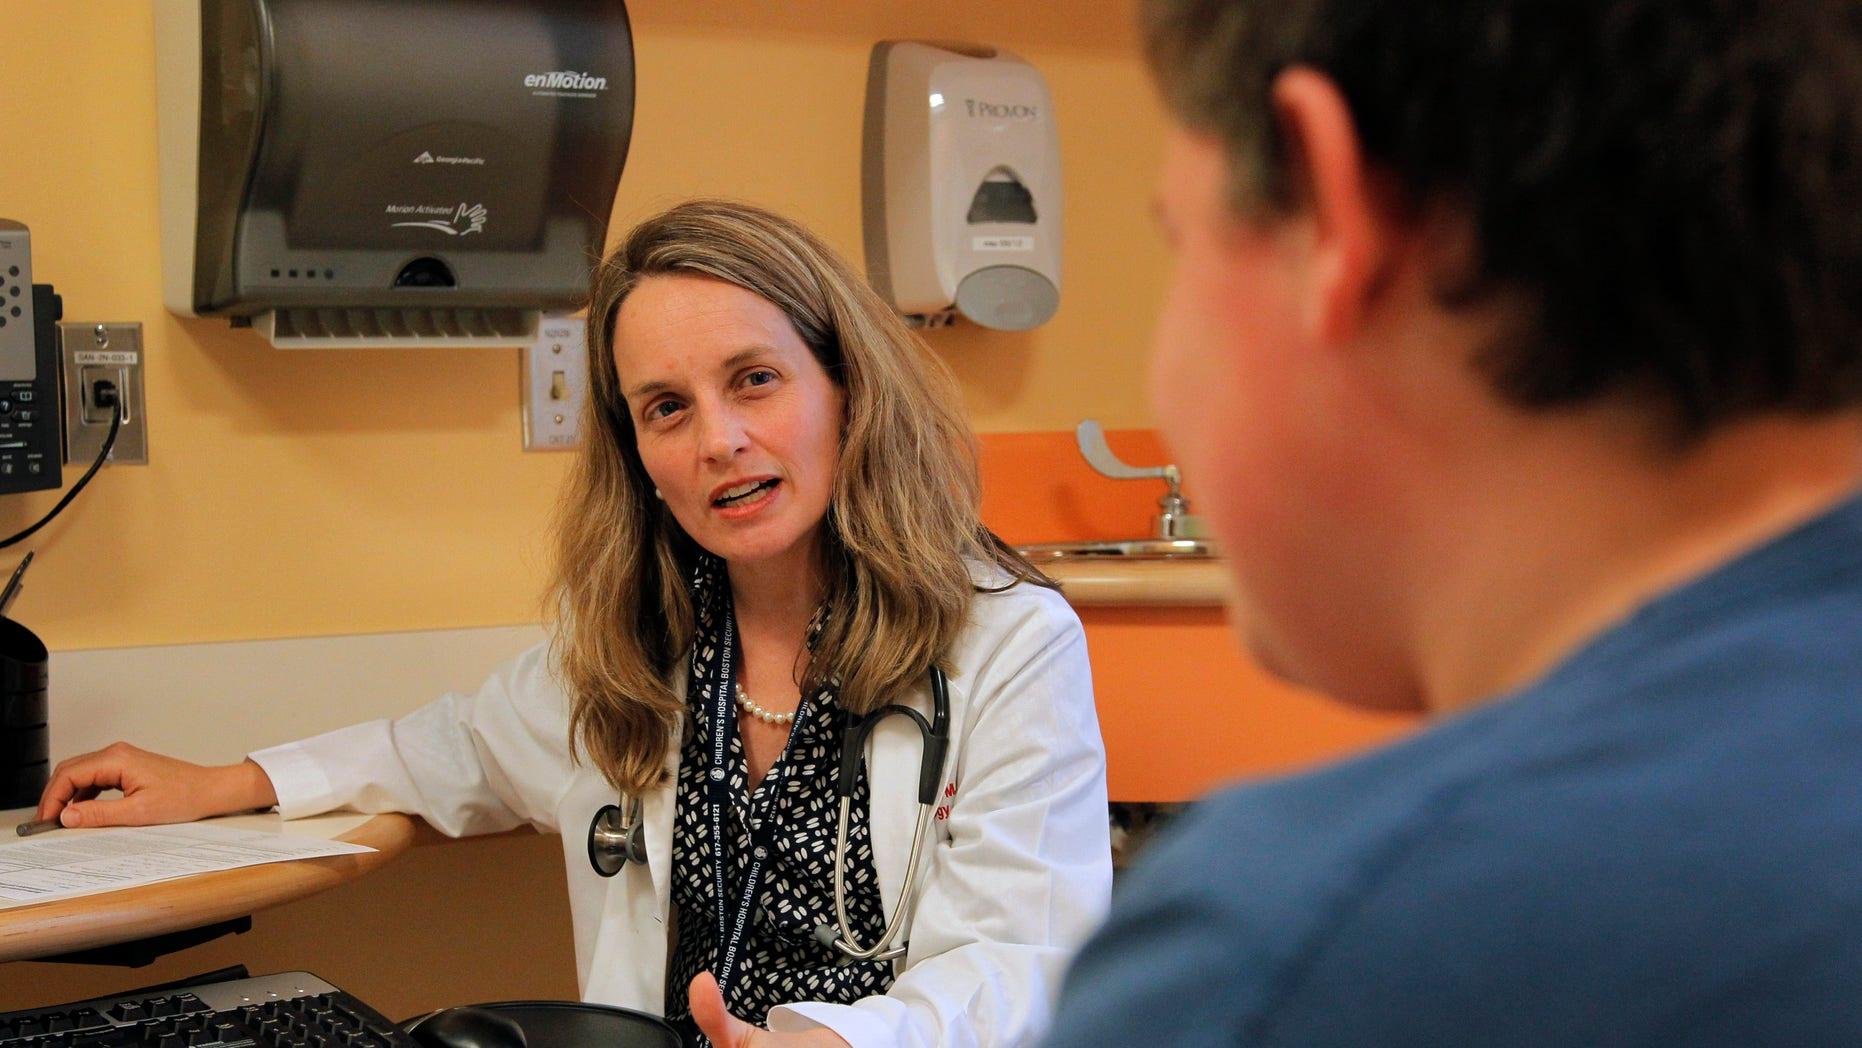 Dr. Sarah de Ferranti, director of preventive cardiology at Boston Children's Hospital, left, meets with patient Quinn Voccio, 14, right, in Waltham, Mass. (AP Photo/Steven Senne)